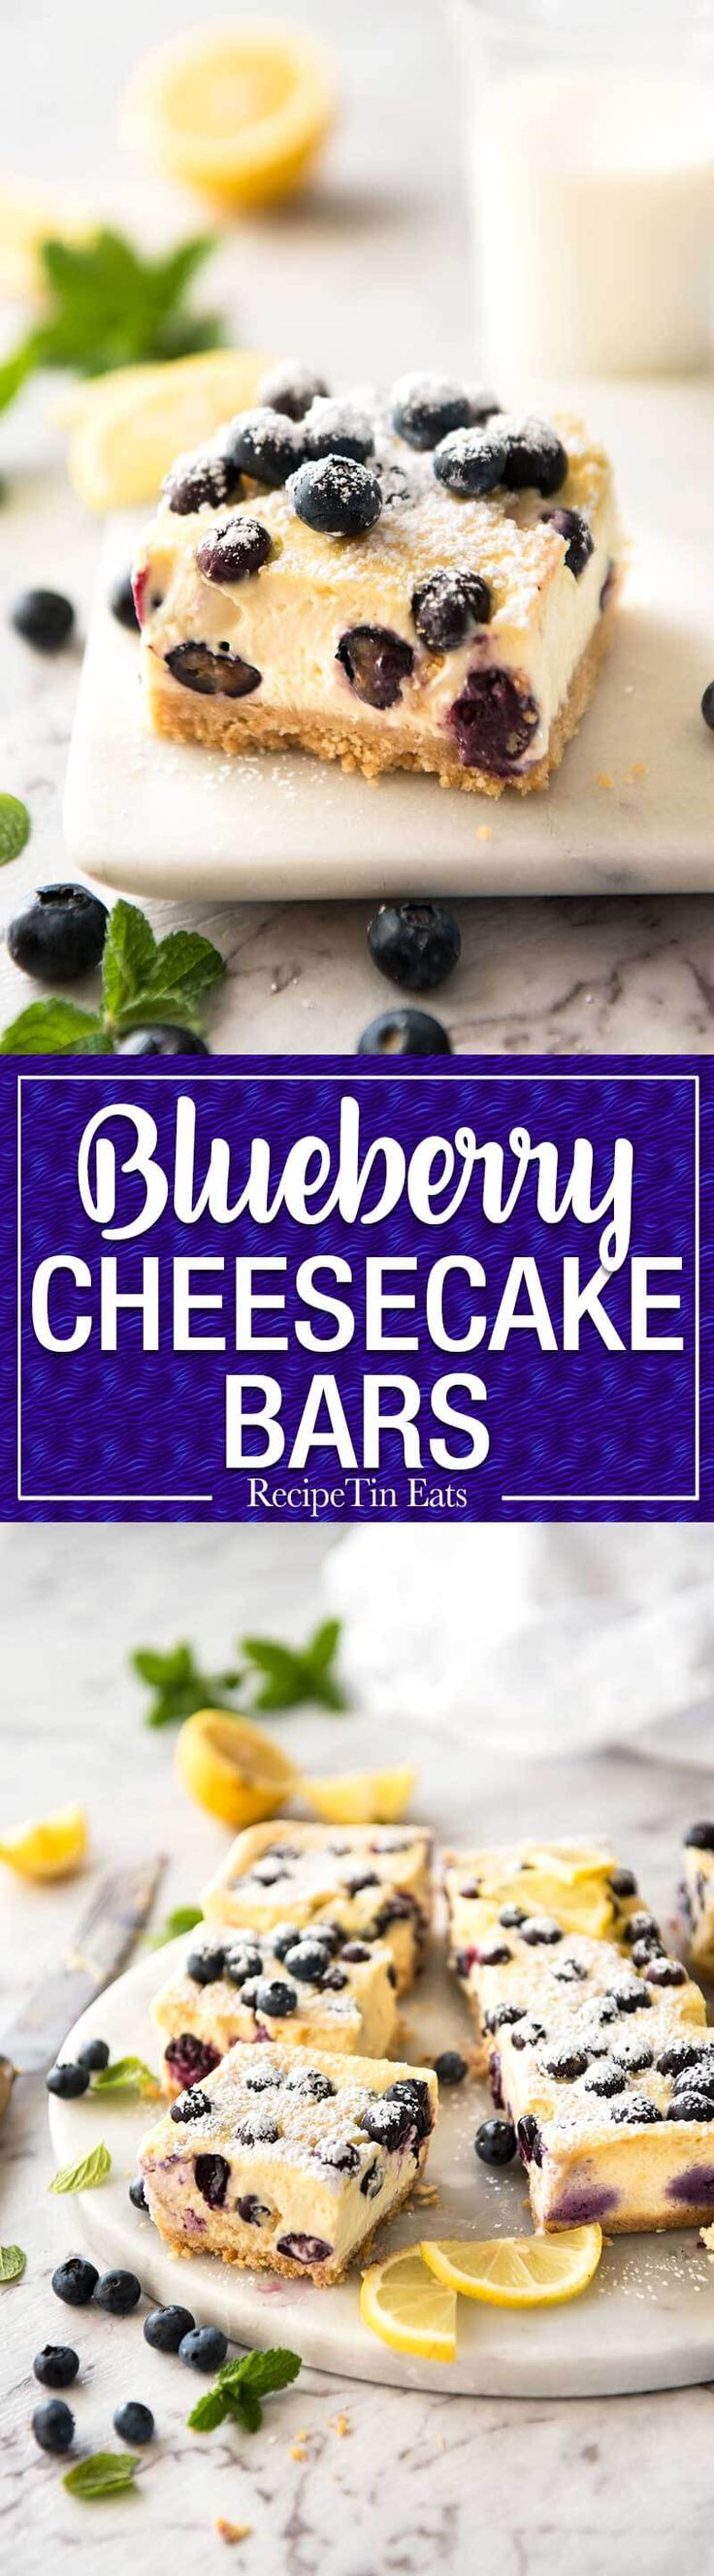 CLASSIC Blueberry Cheesecake Bars